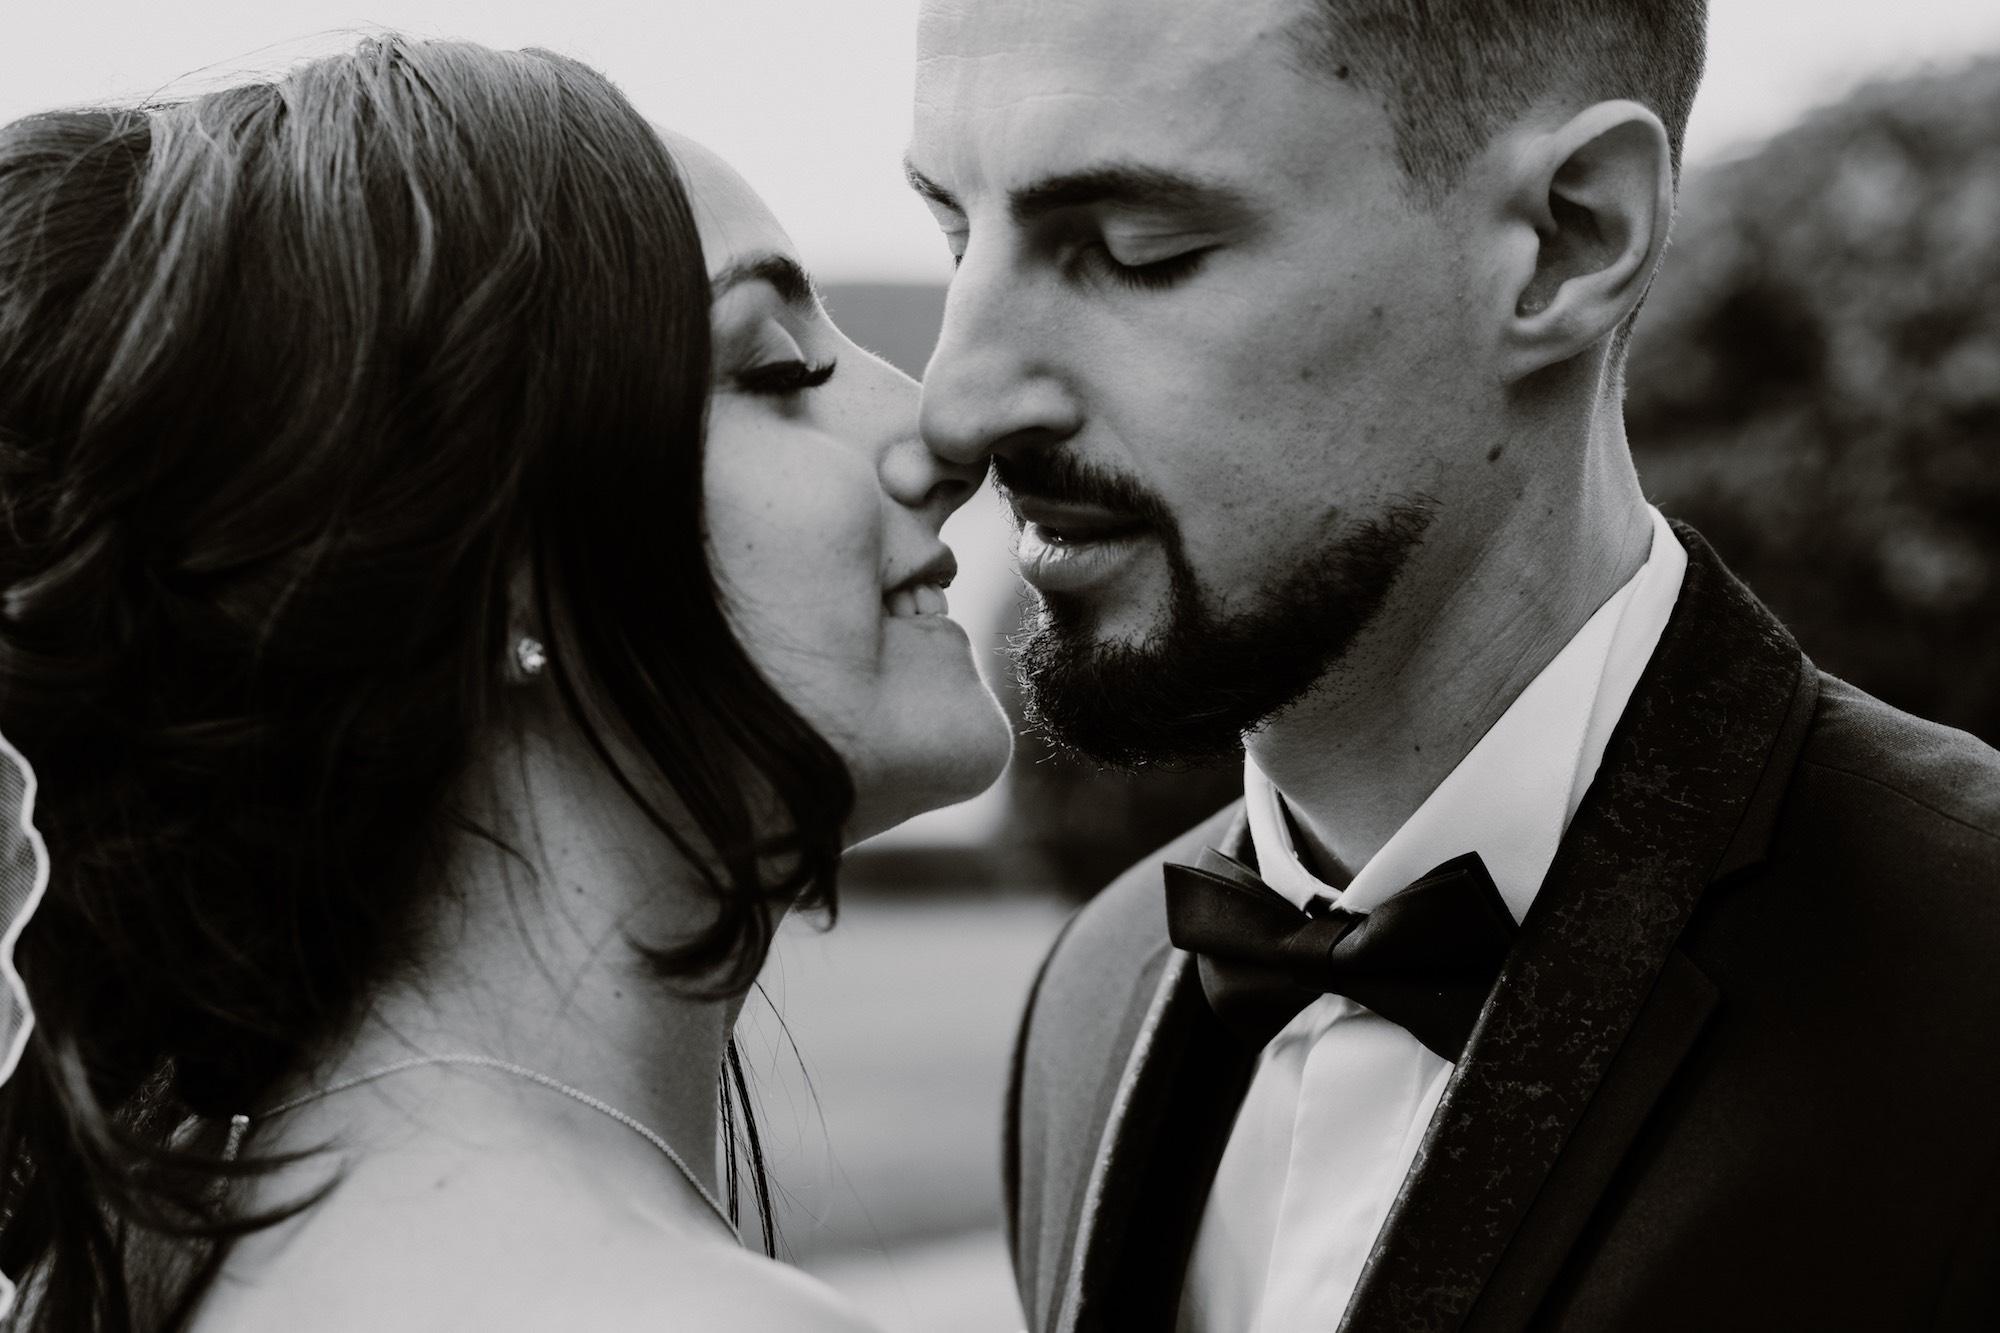 Mariage Elodie Philippe 303 - Dagmara Bojenko - Eco-conscious Weddings, Births & Families